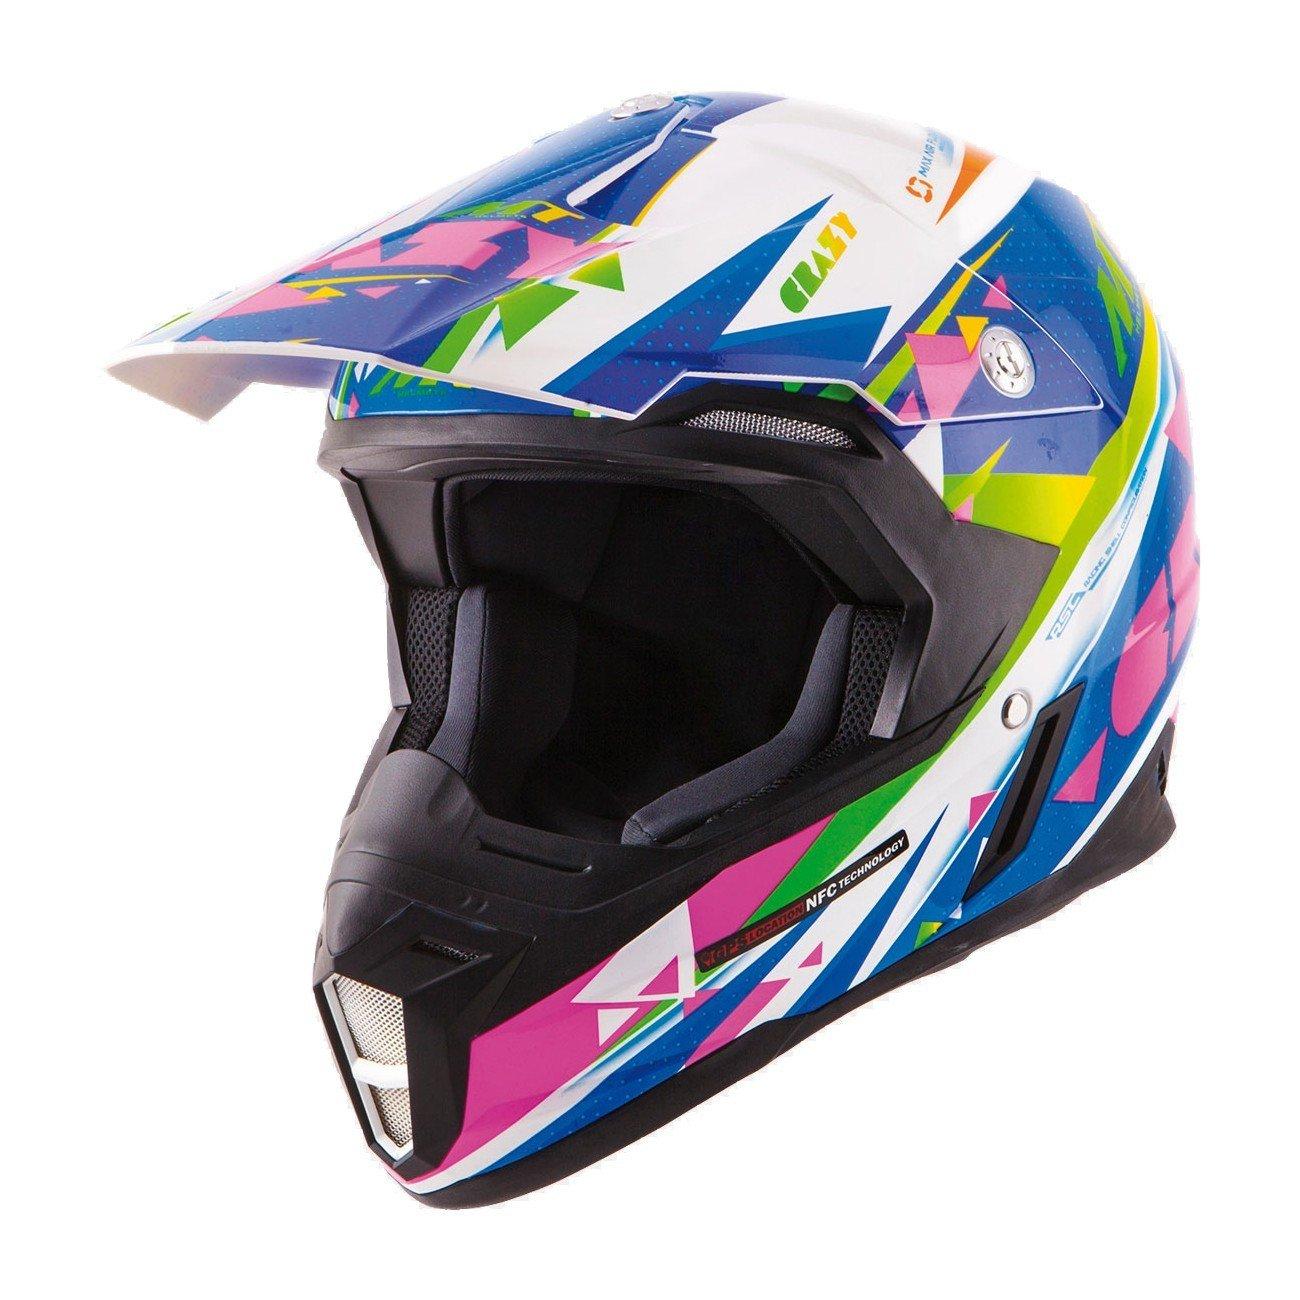 Motokrosová přilba MT Helmets Synchrony Crazy XXL (63/64)